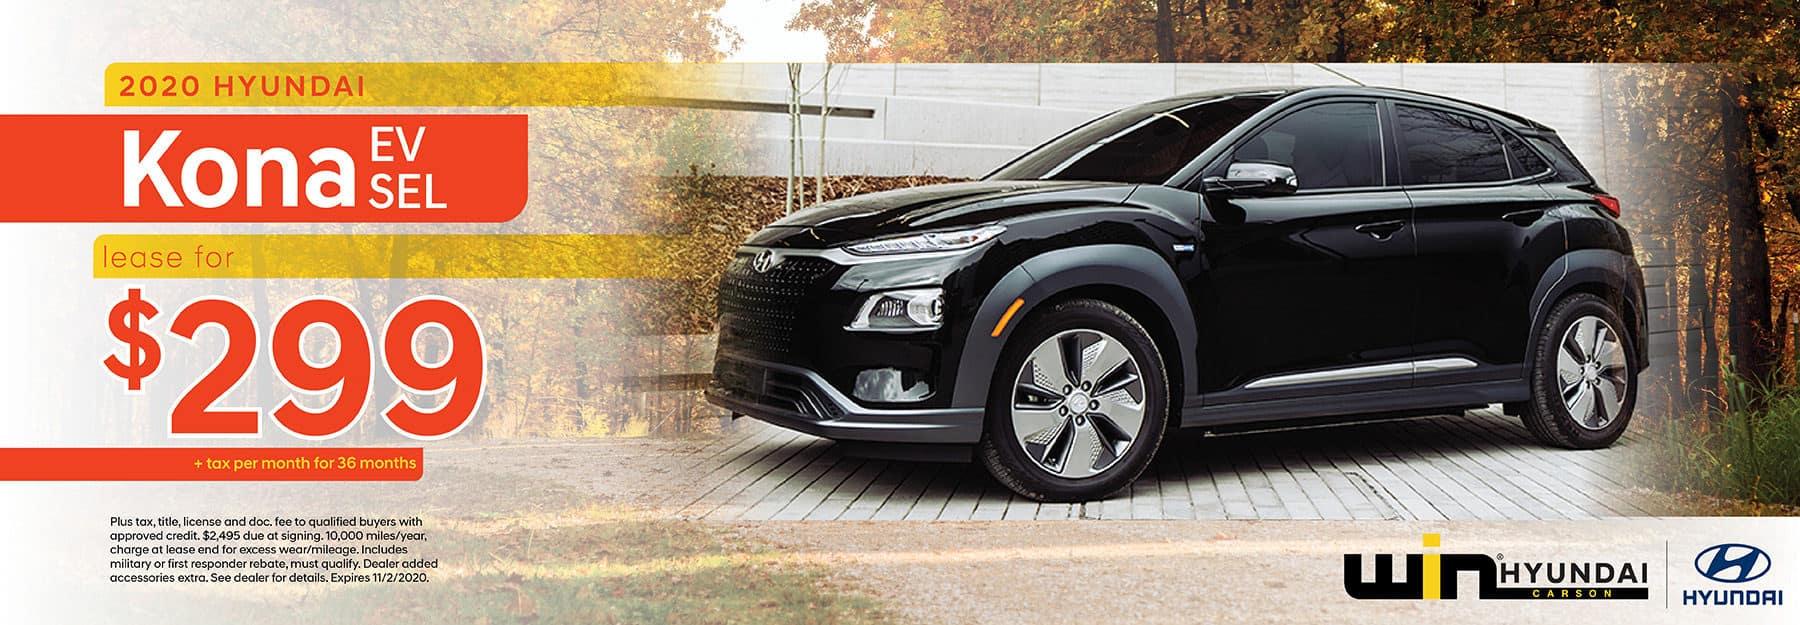 2020 Hyundai Kona EV SEL Lease for $299 | Carson, CA